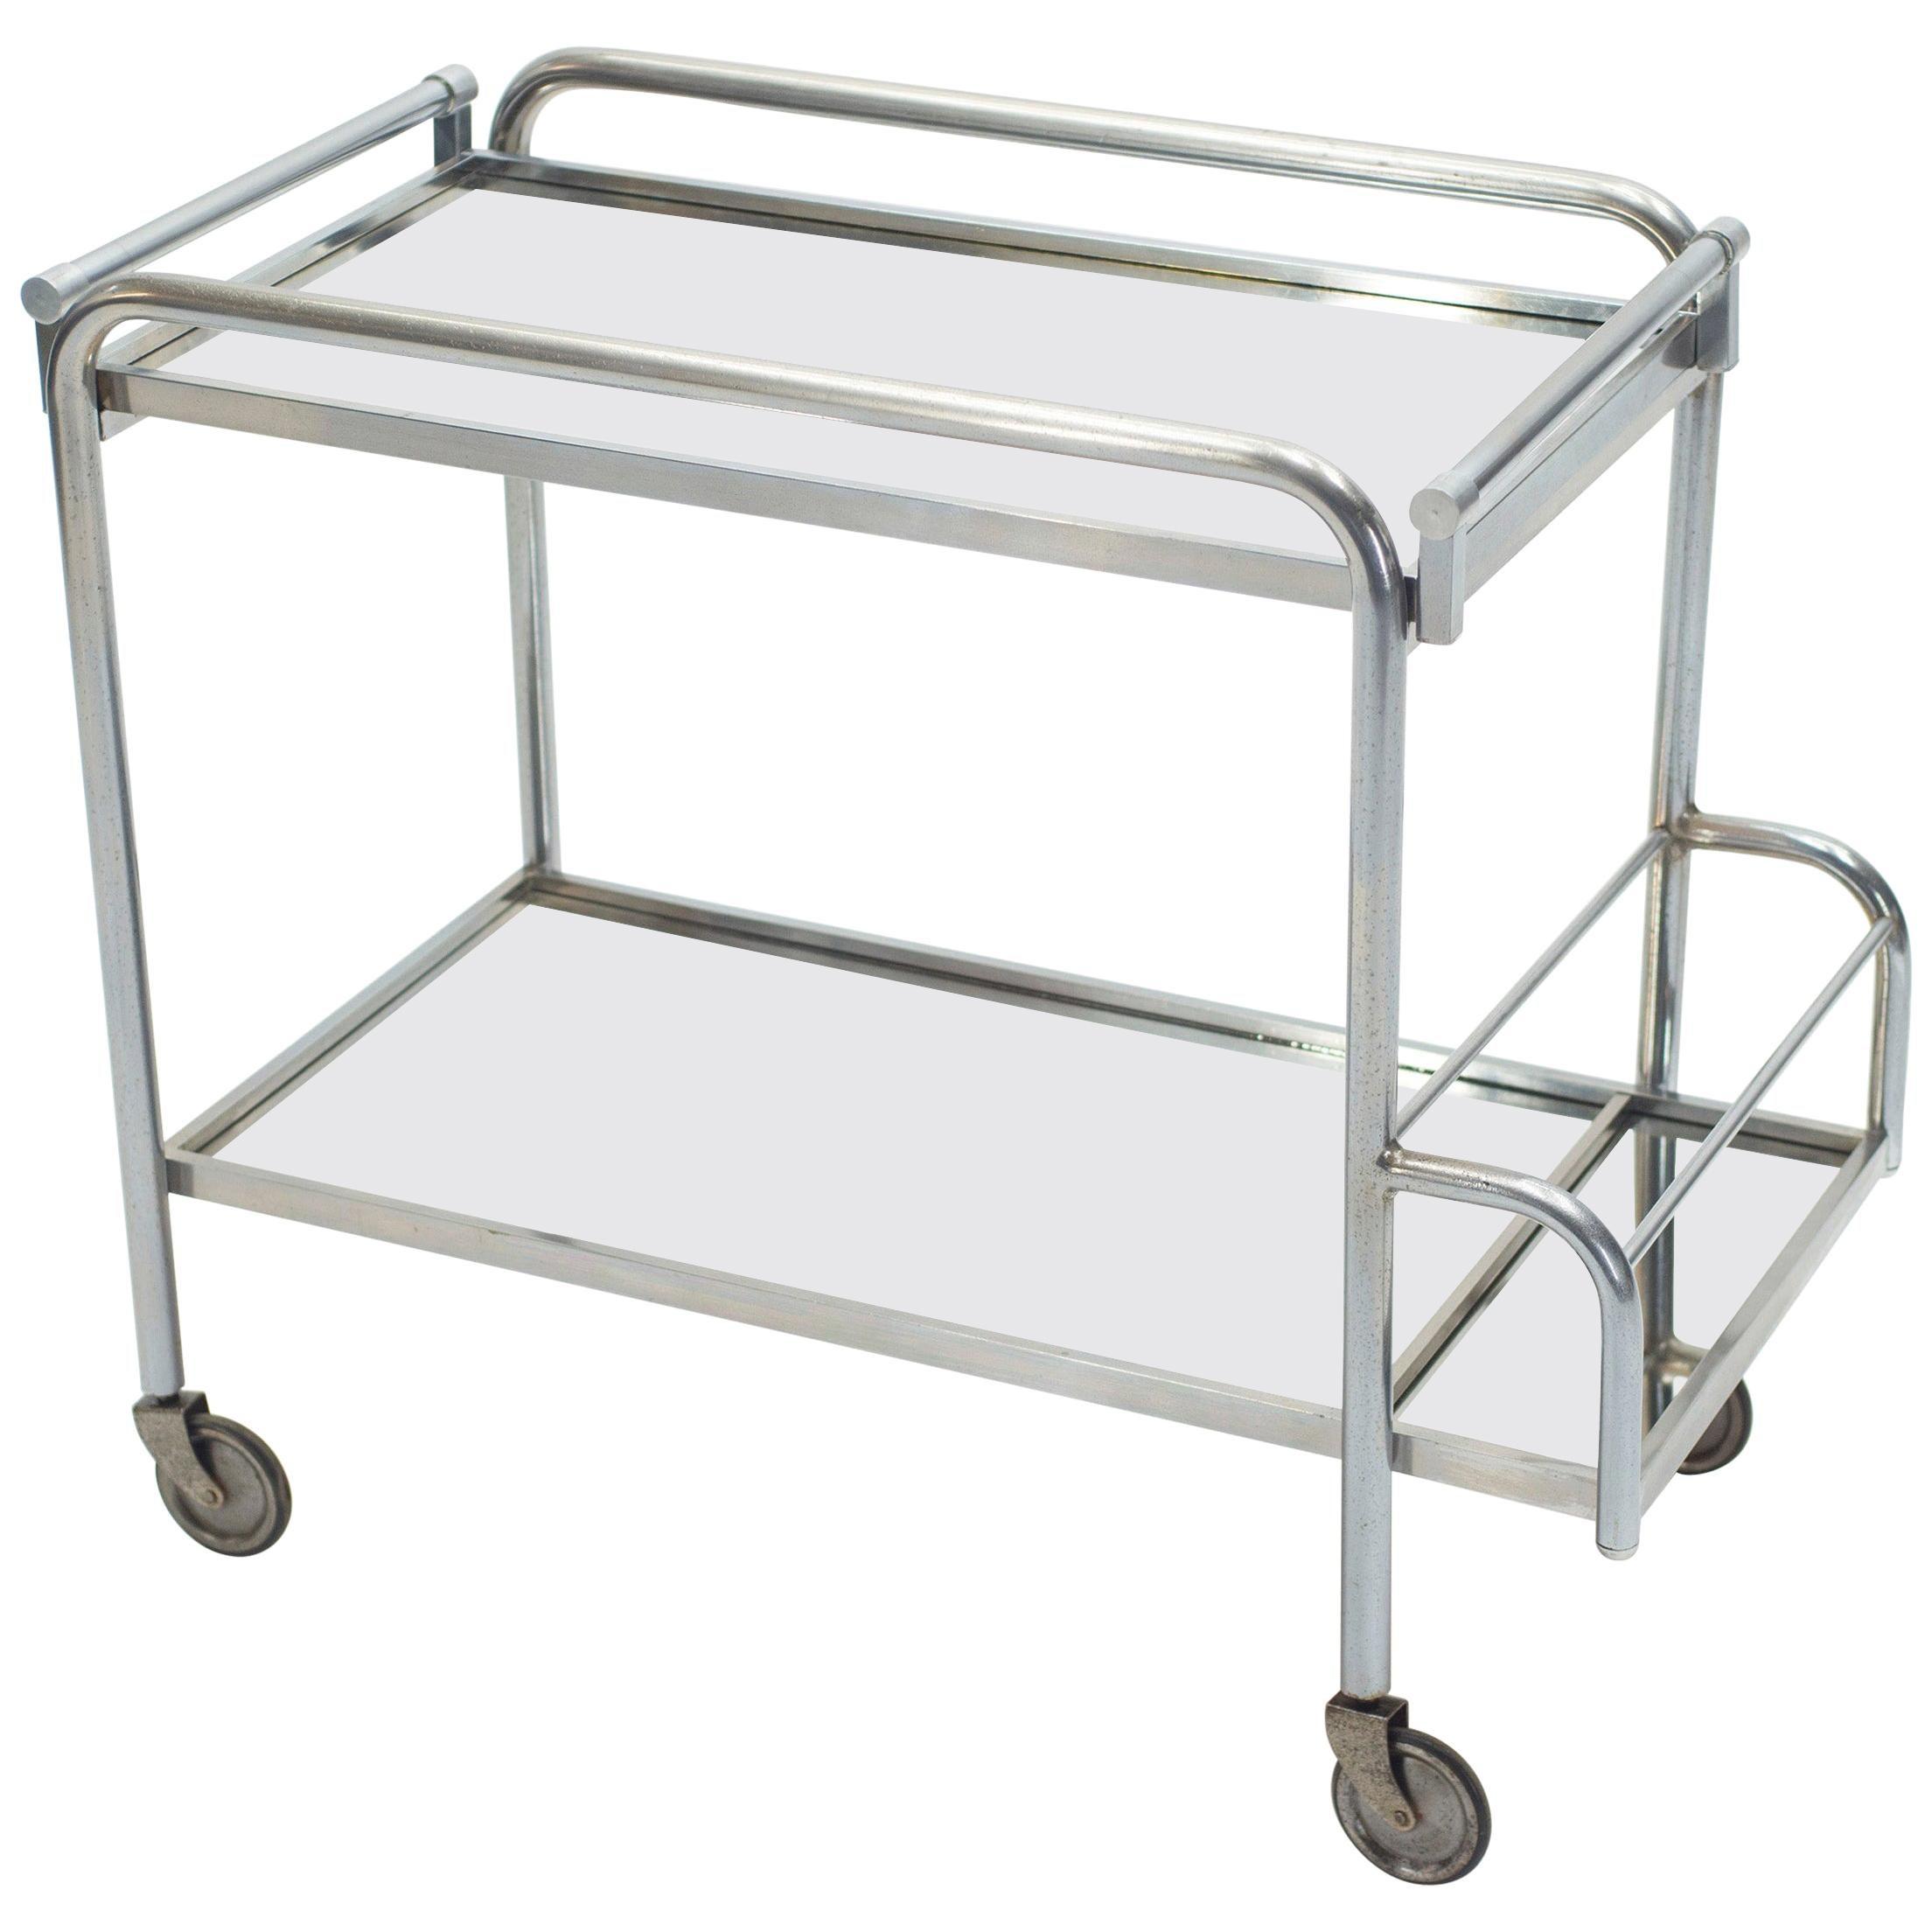 Jacques Adnet Art Deco Mirrored Bar Cart Trolley, 1930s